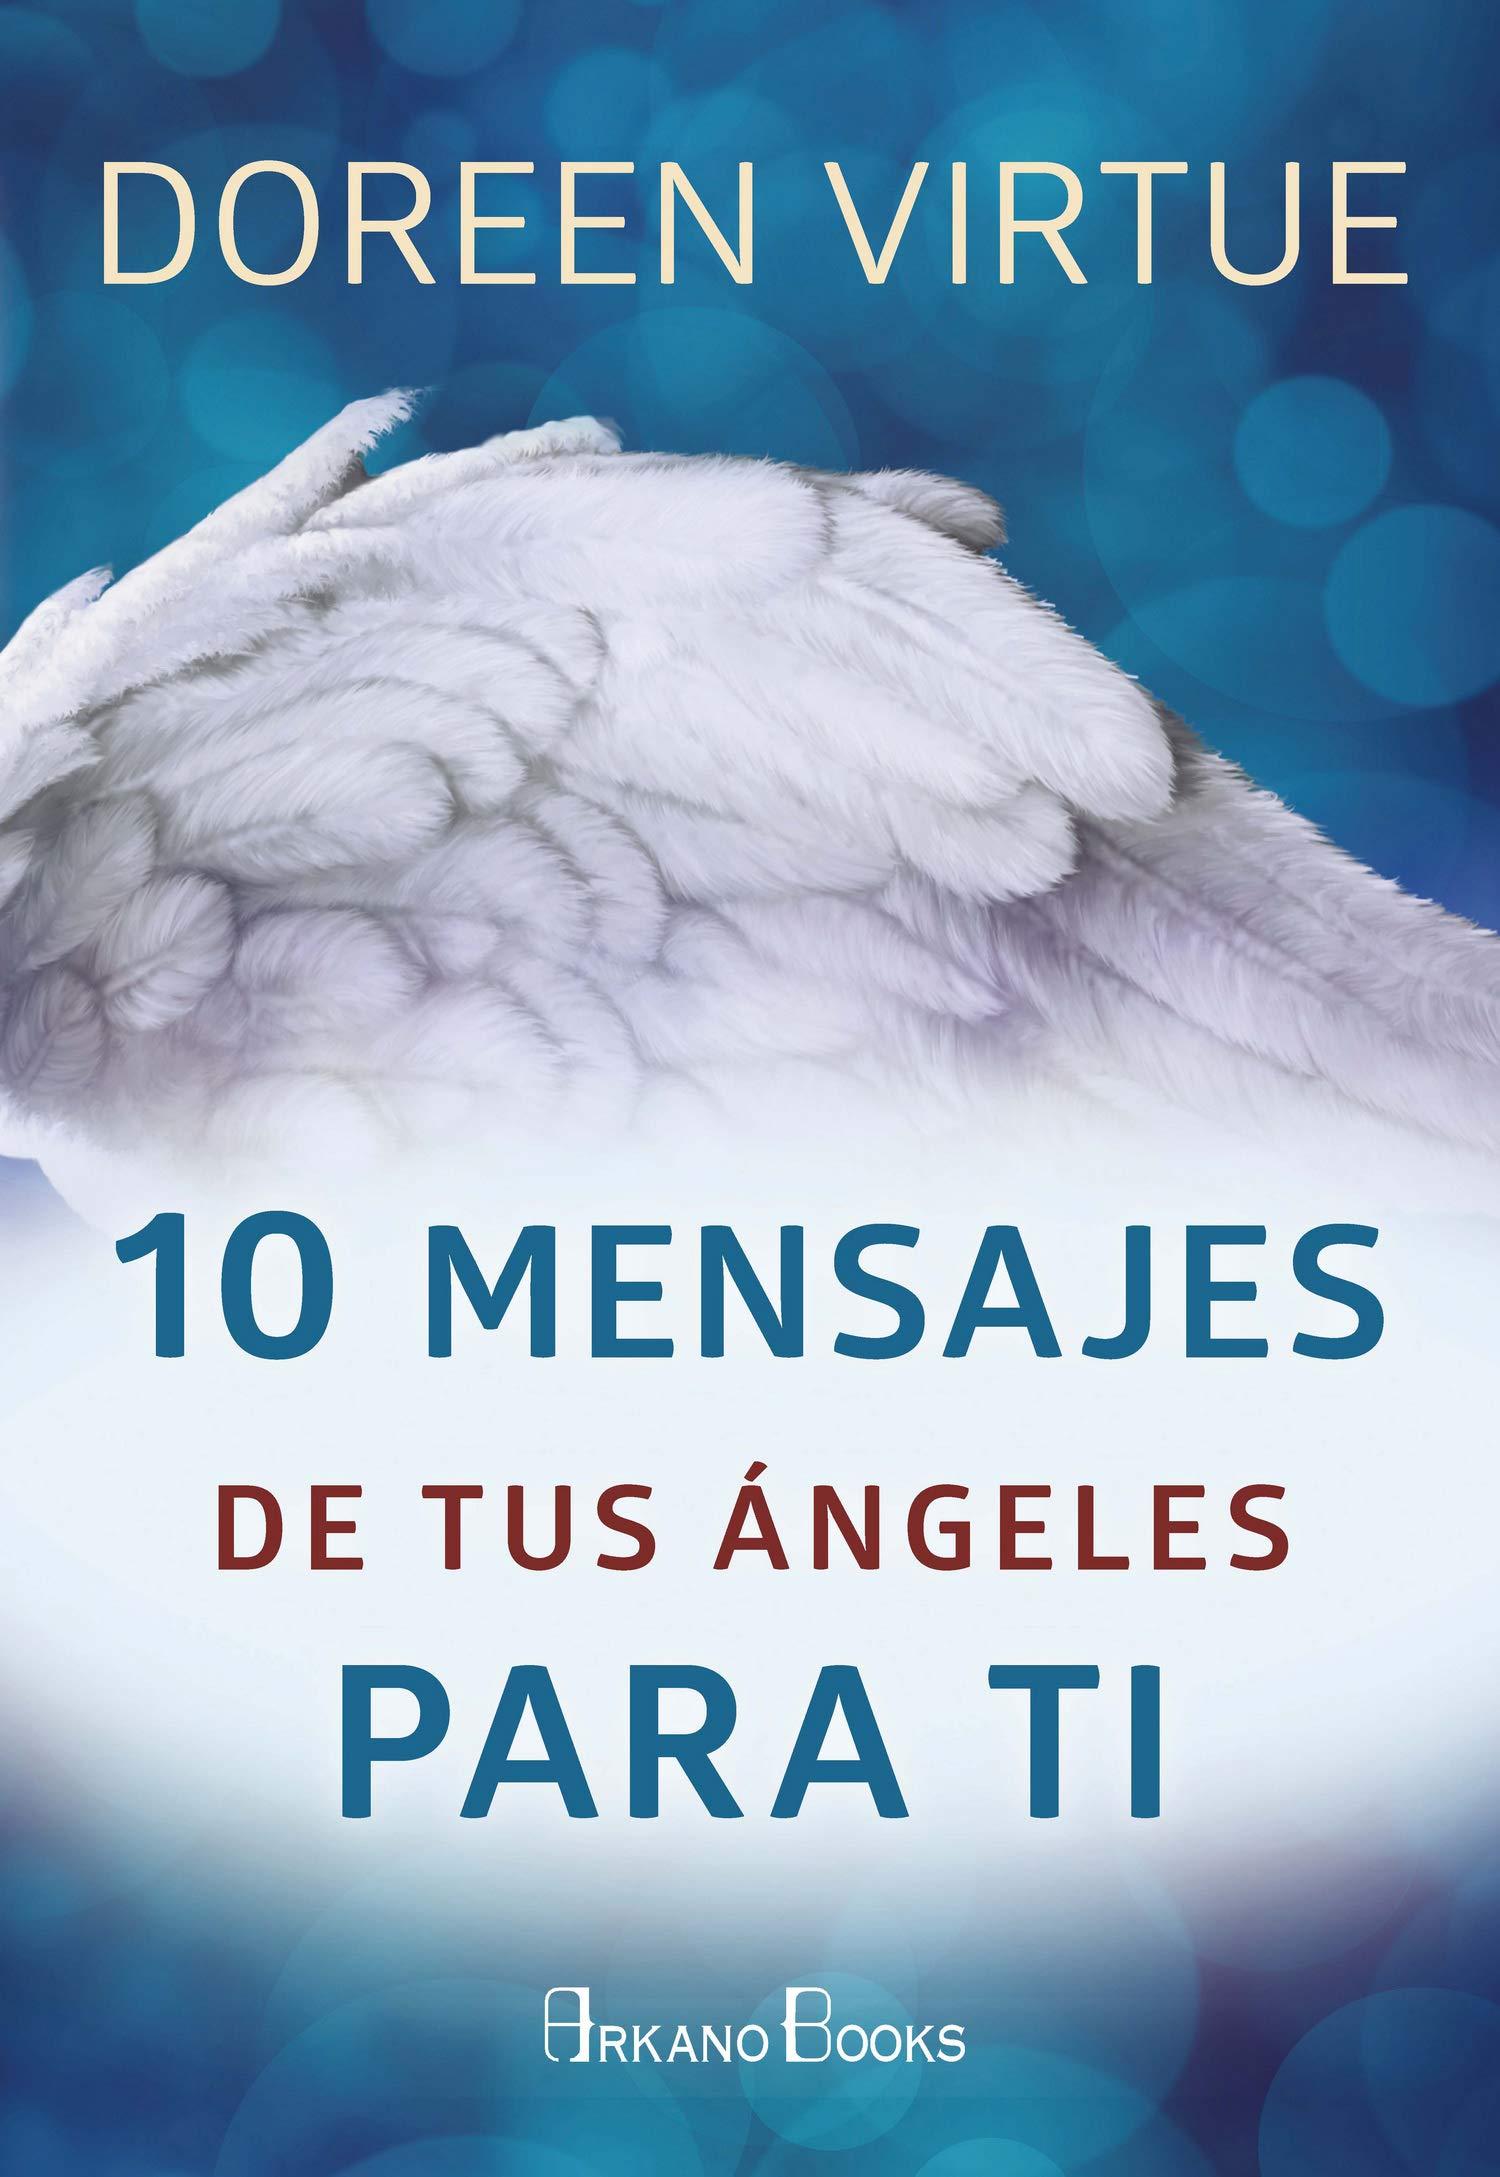 10 mensajes de tus ángeles para ti (Doreen Virtue): Amazon.es: Doreen Virtue, Isabel Blanco González: Libros